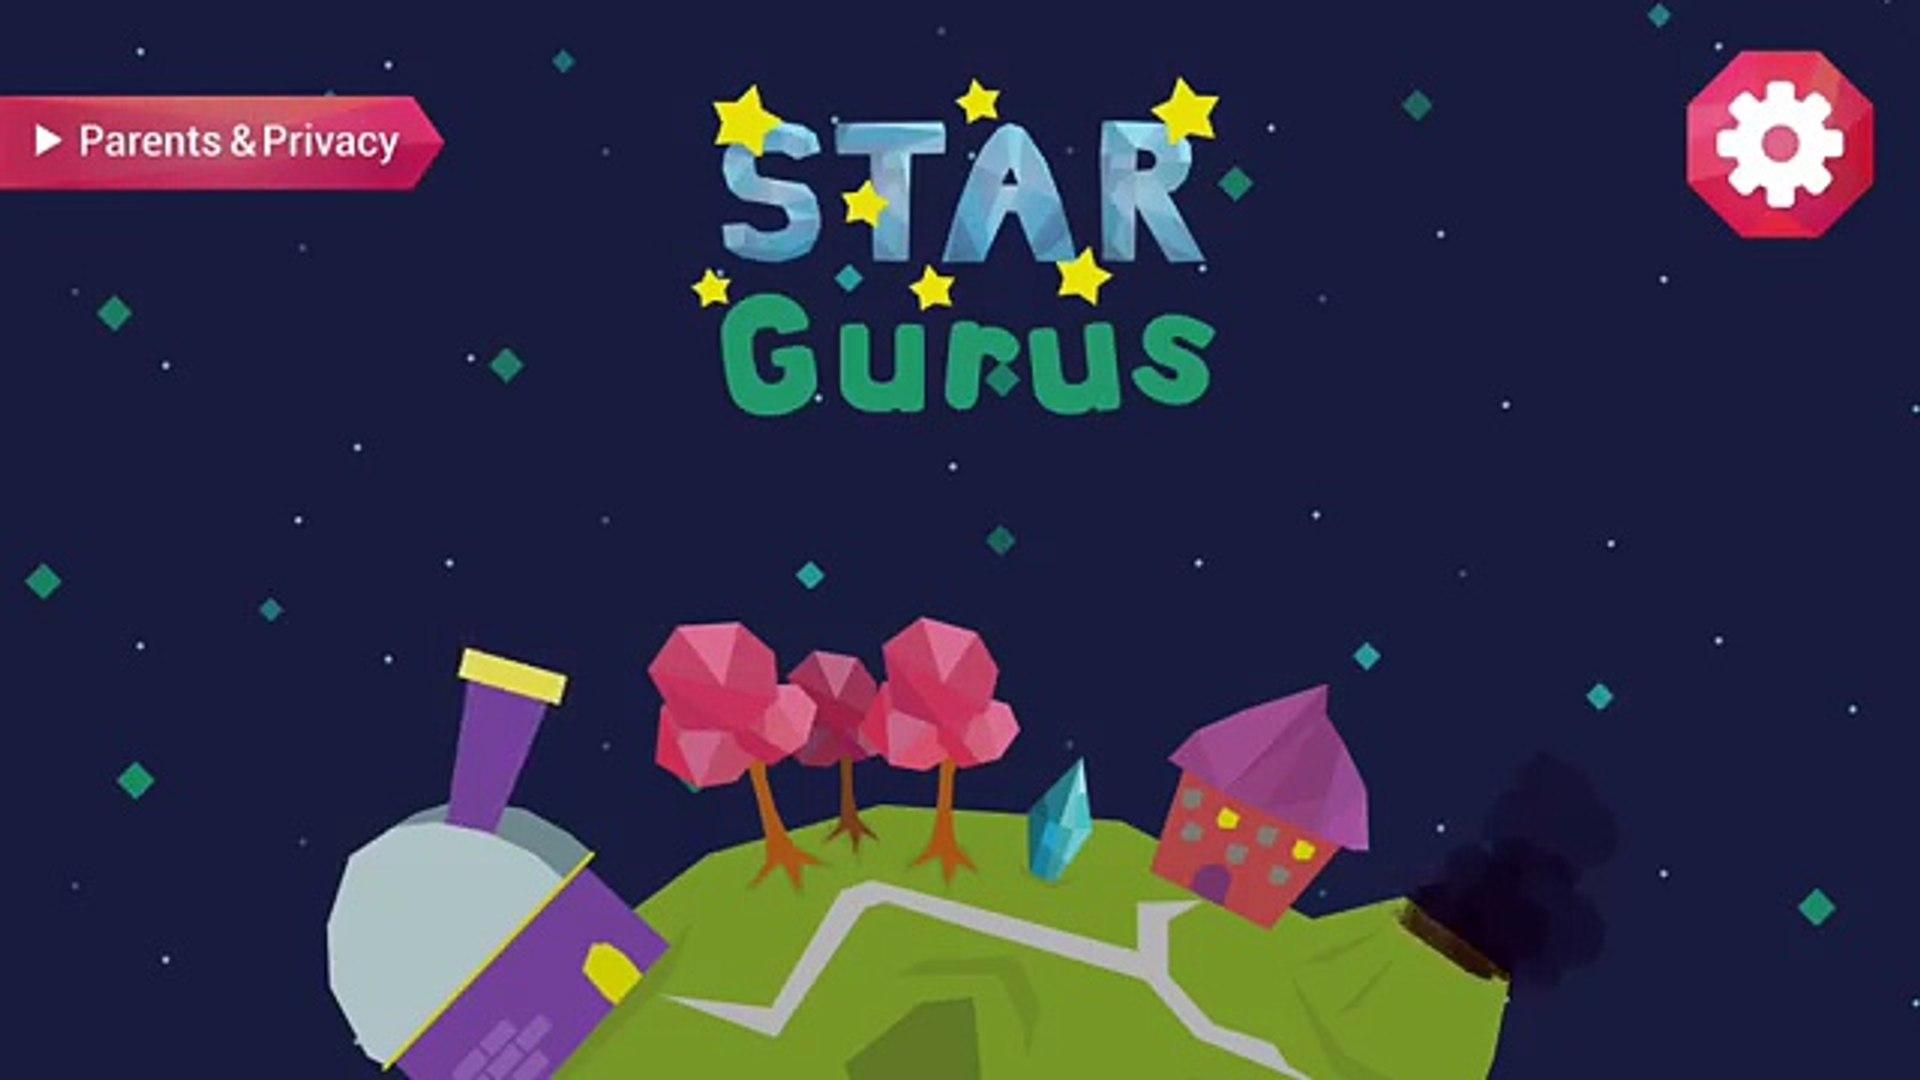 Star Gurus: Kids Education App